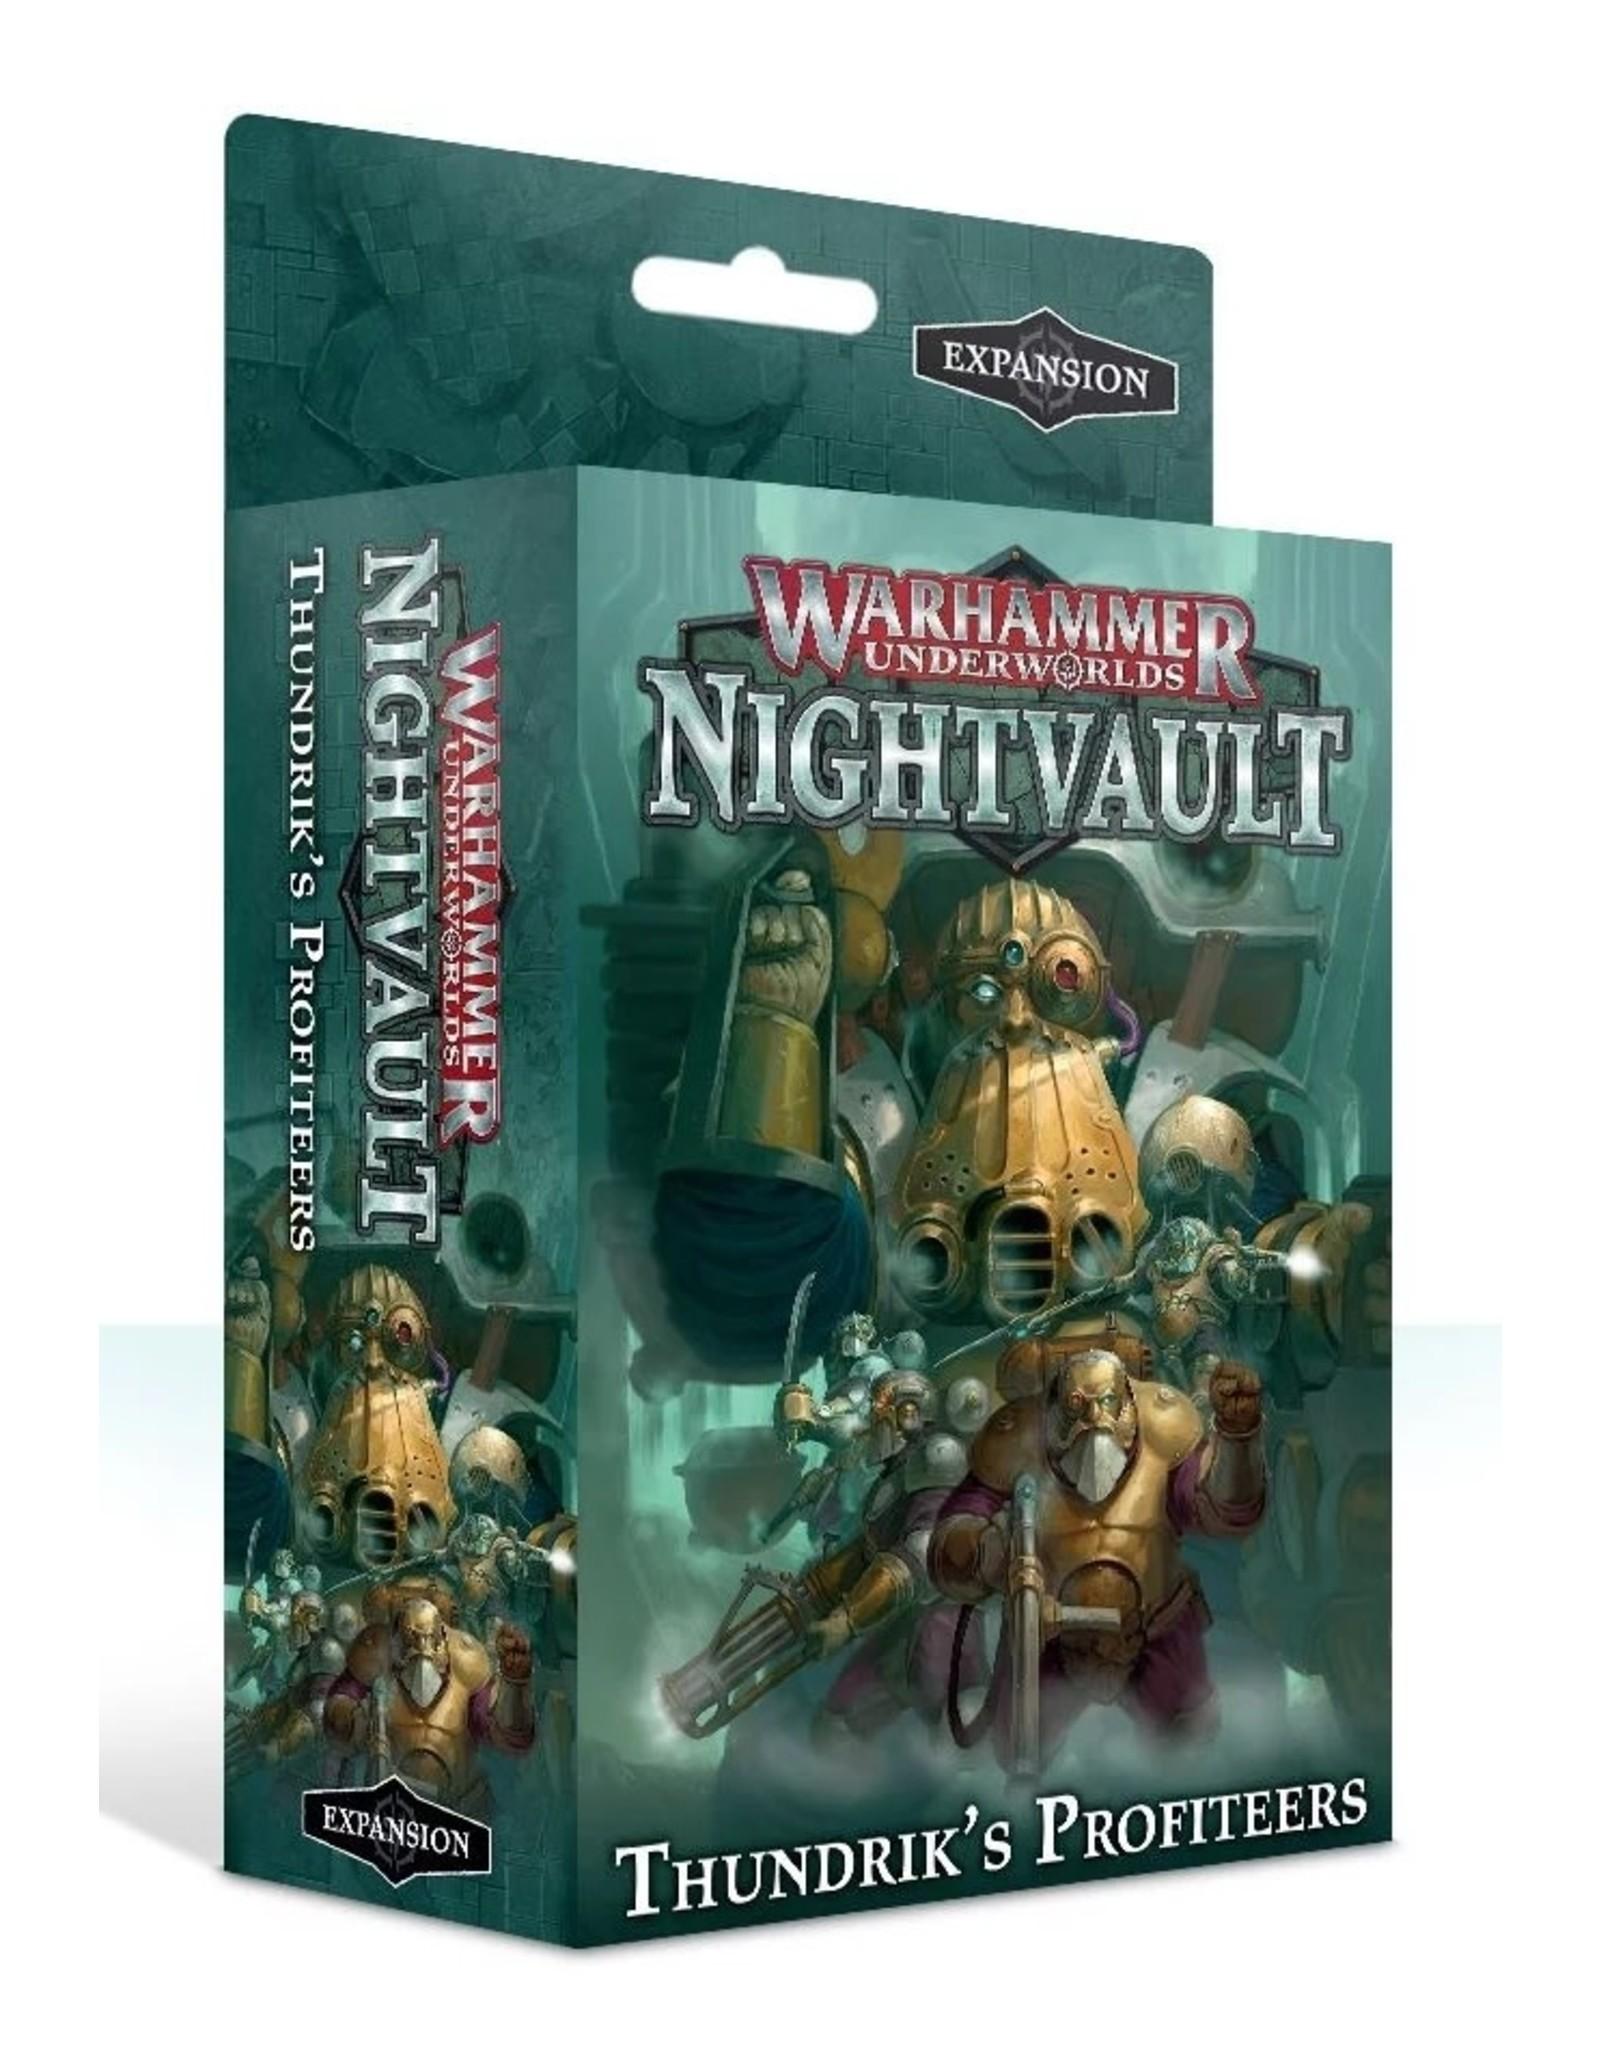 Warhammer Underworlds Kharadron Overlords: Thundrik's Profiteers